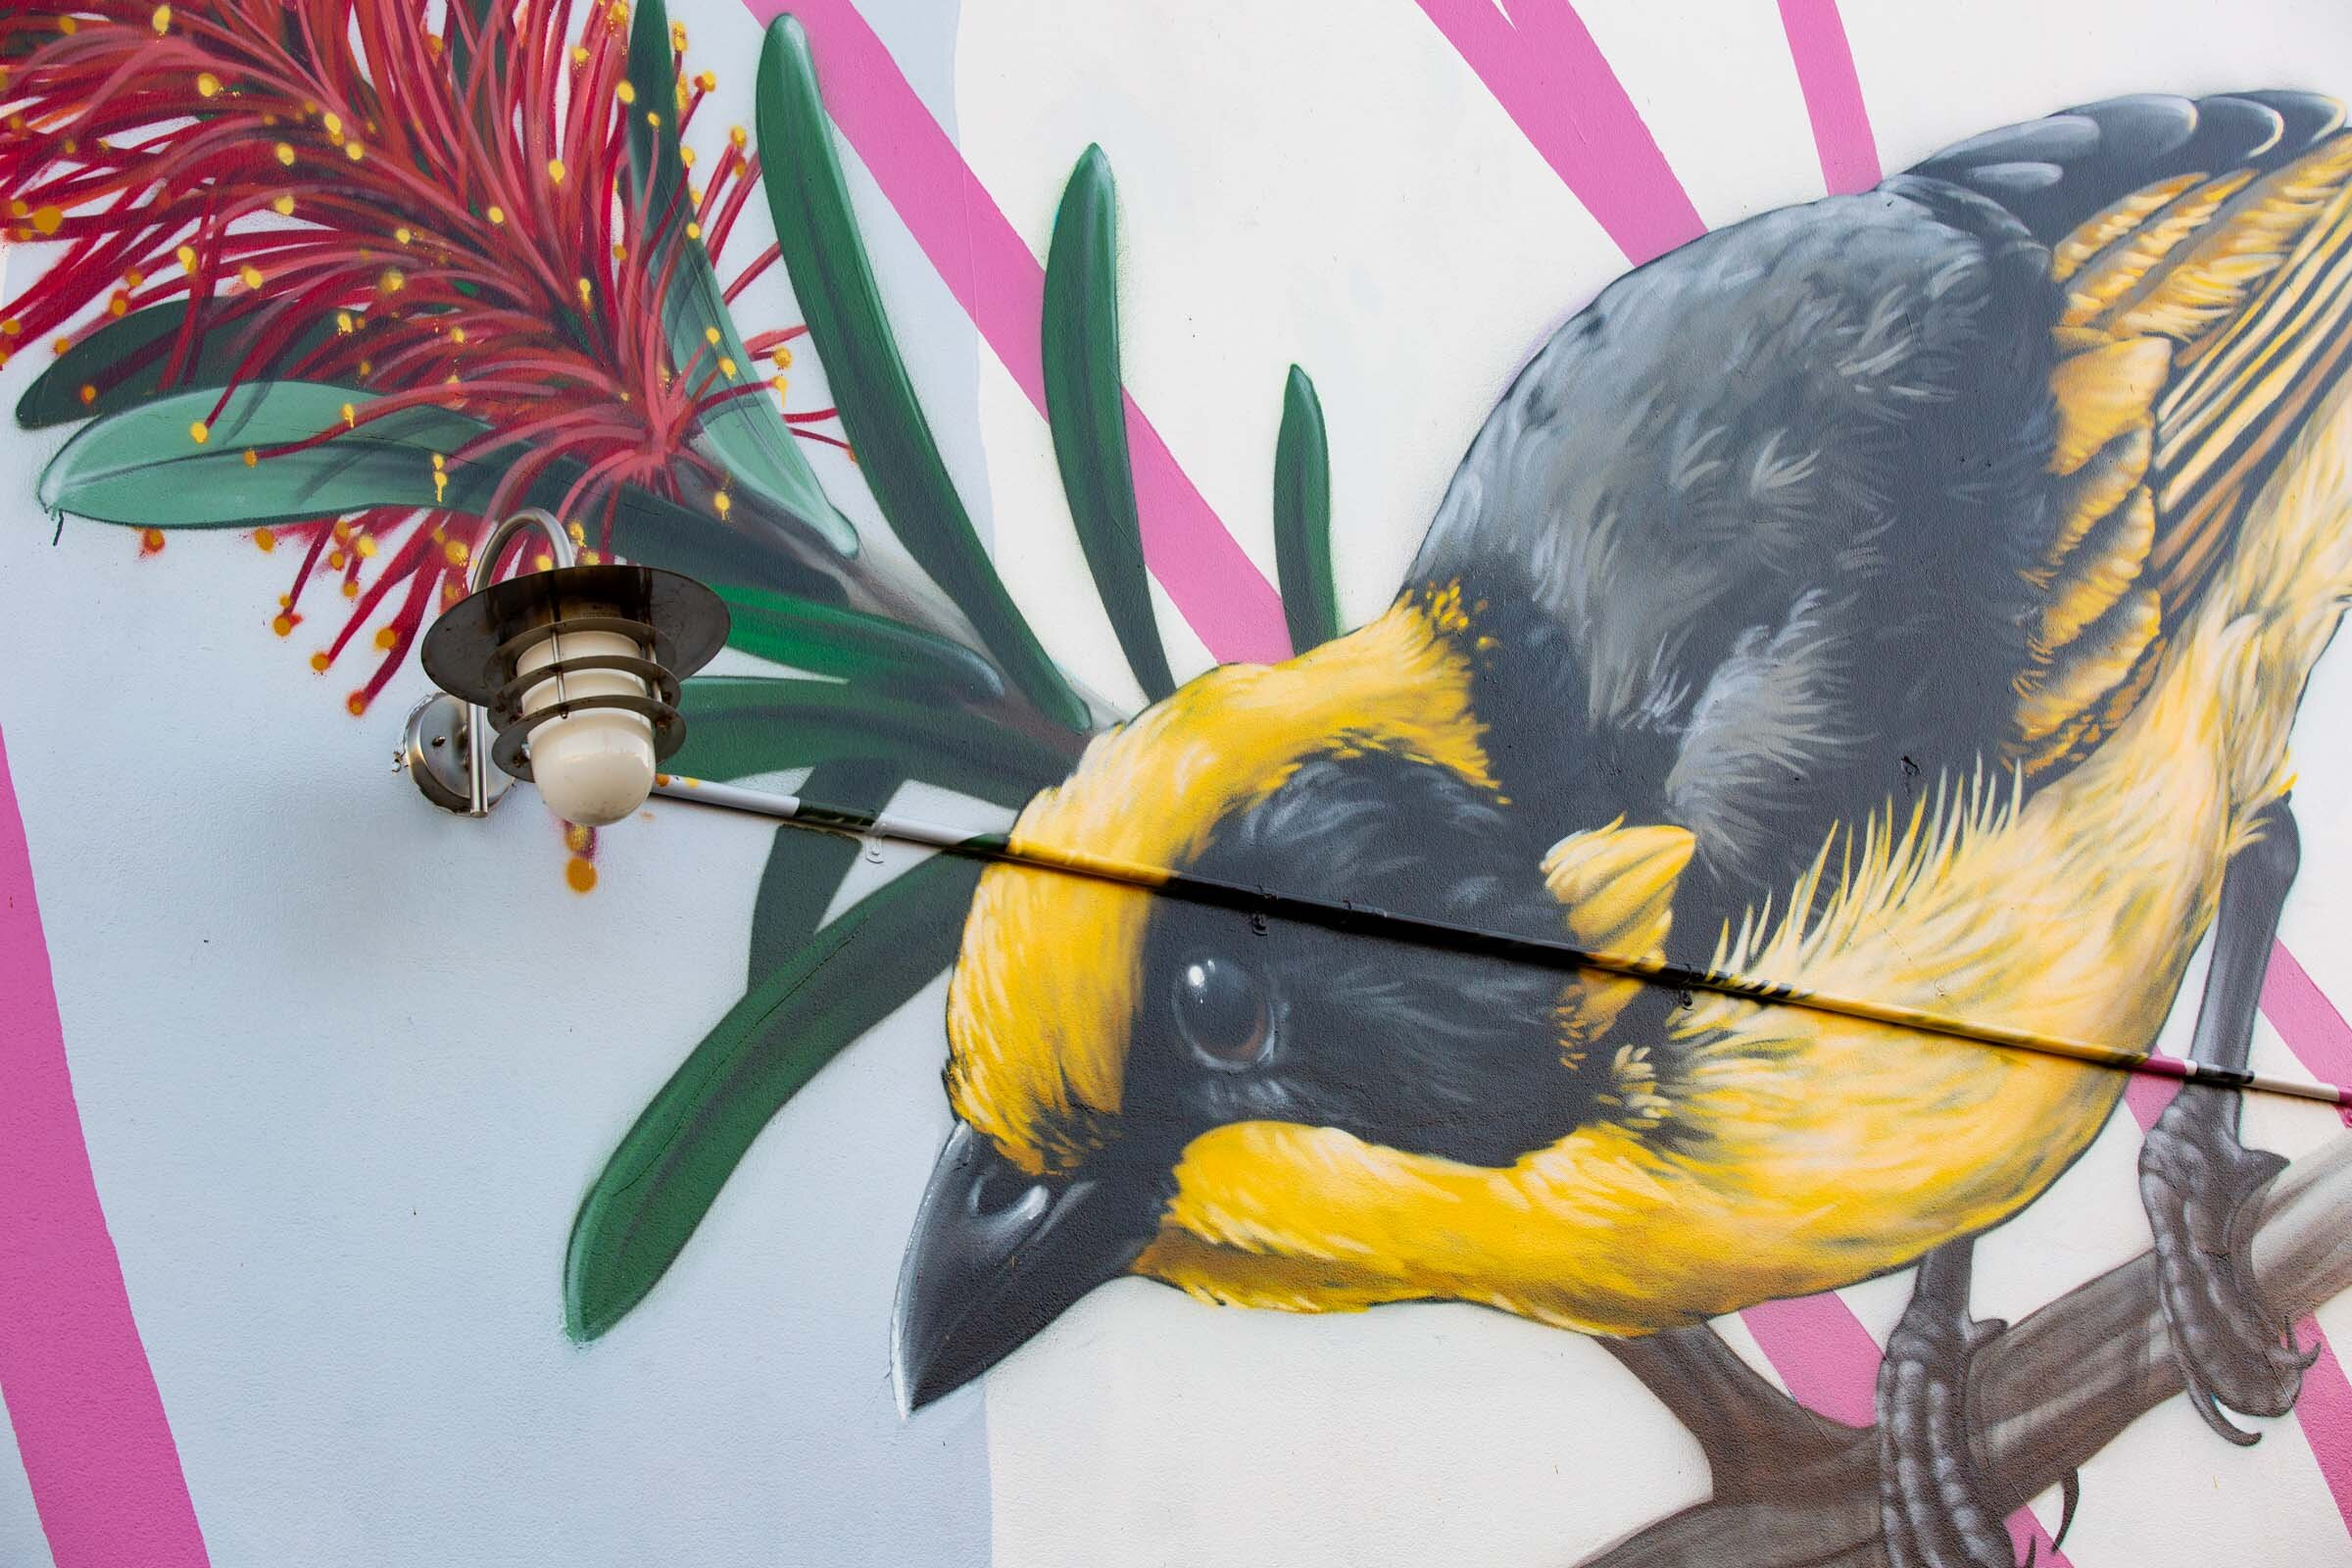 Thomas Jackson's mural in Windsor. Image credit: Art Pharmacy Consulting / Jodie Barker